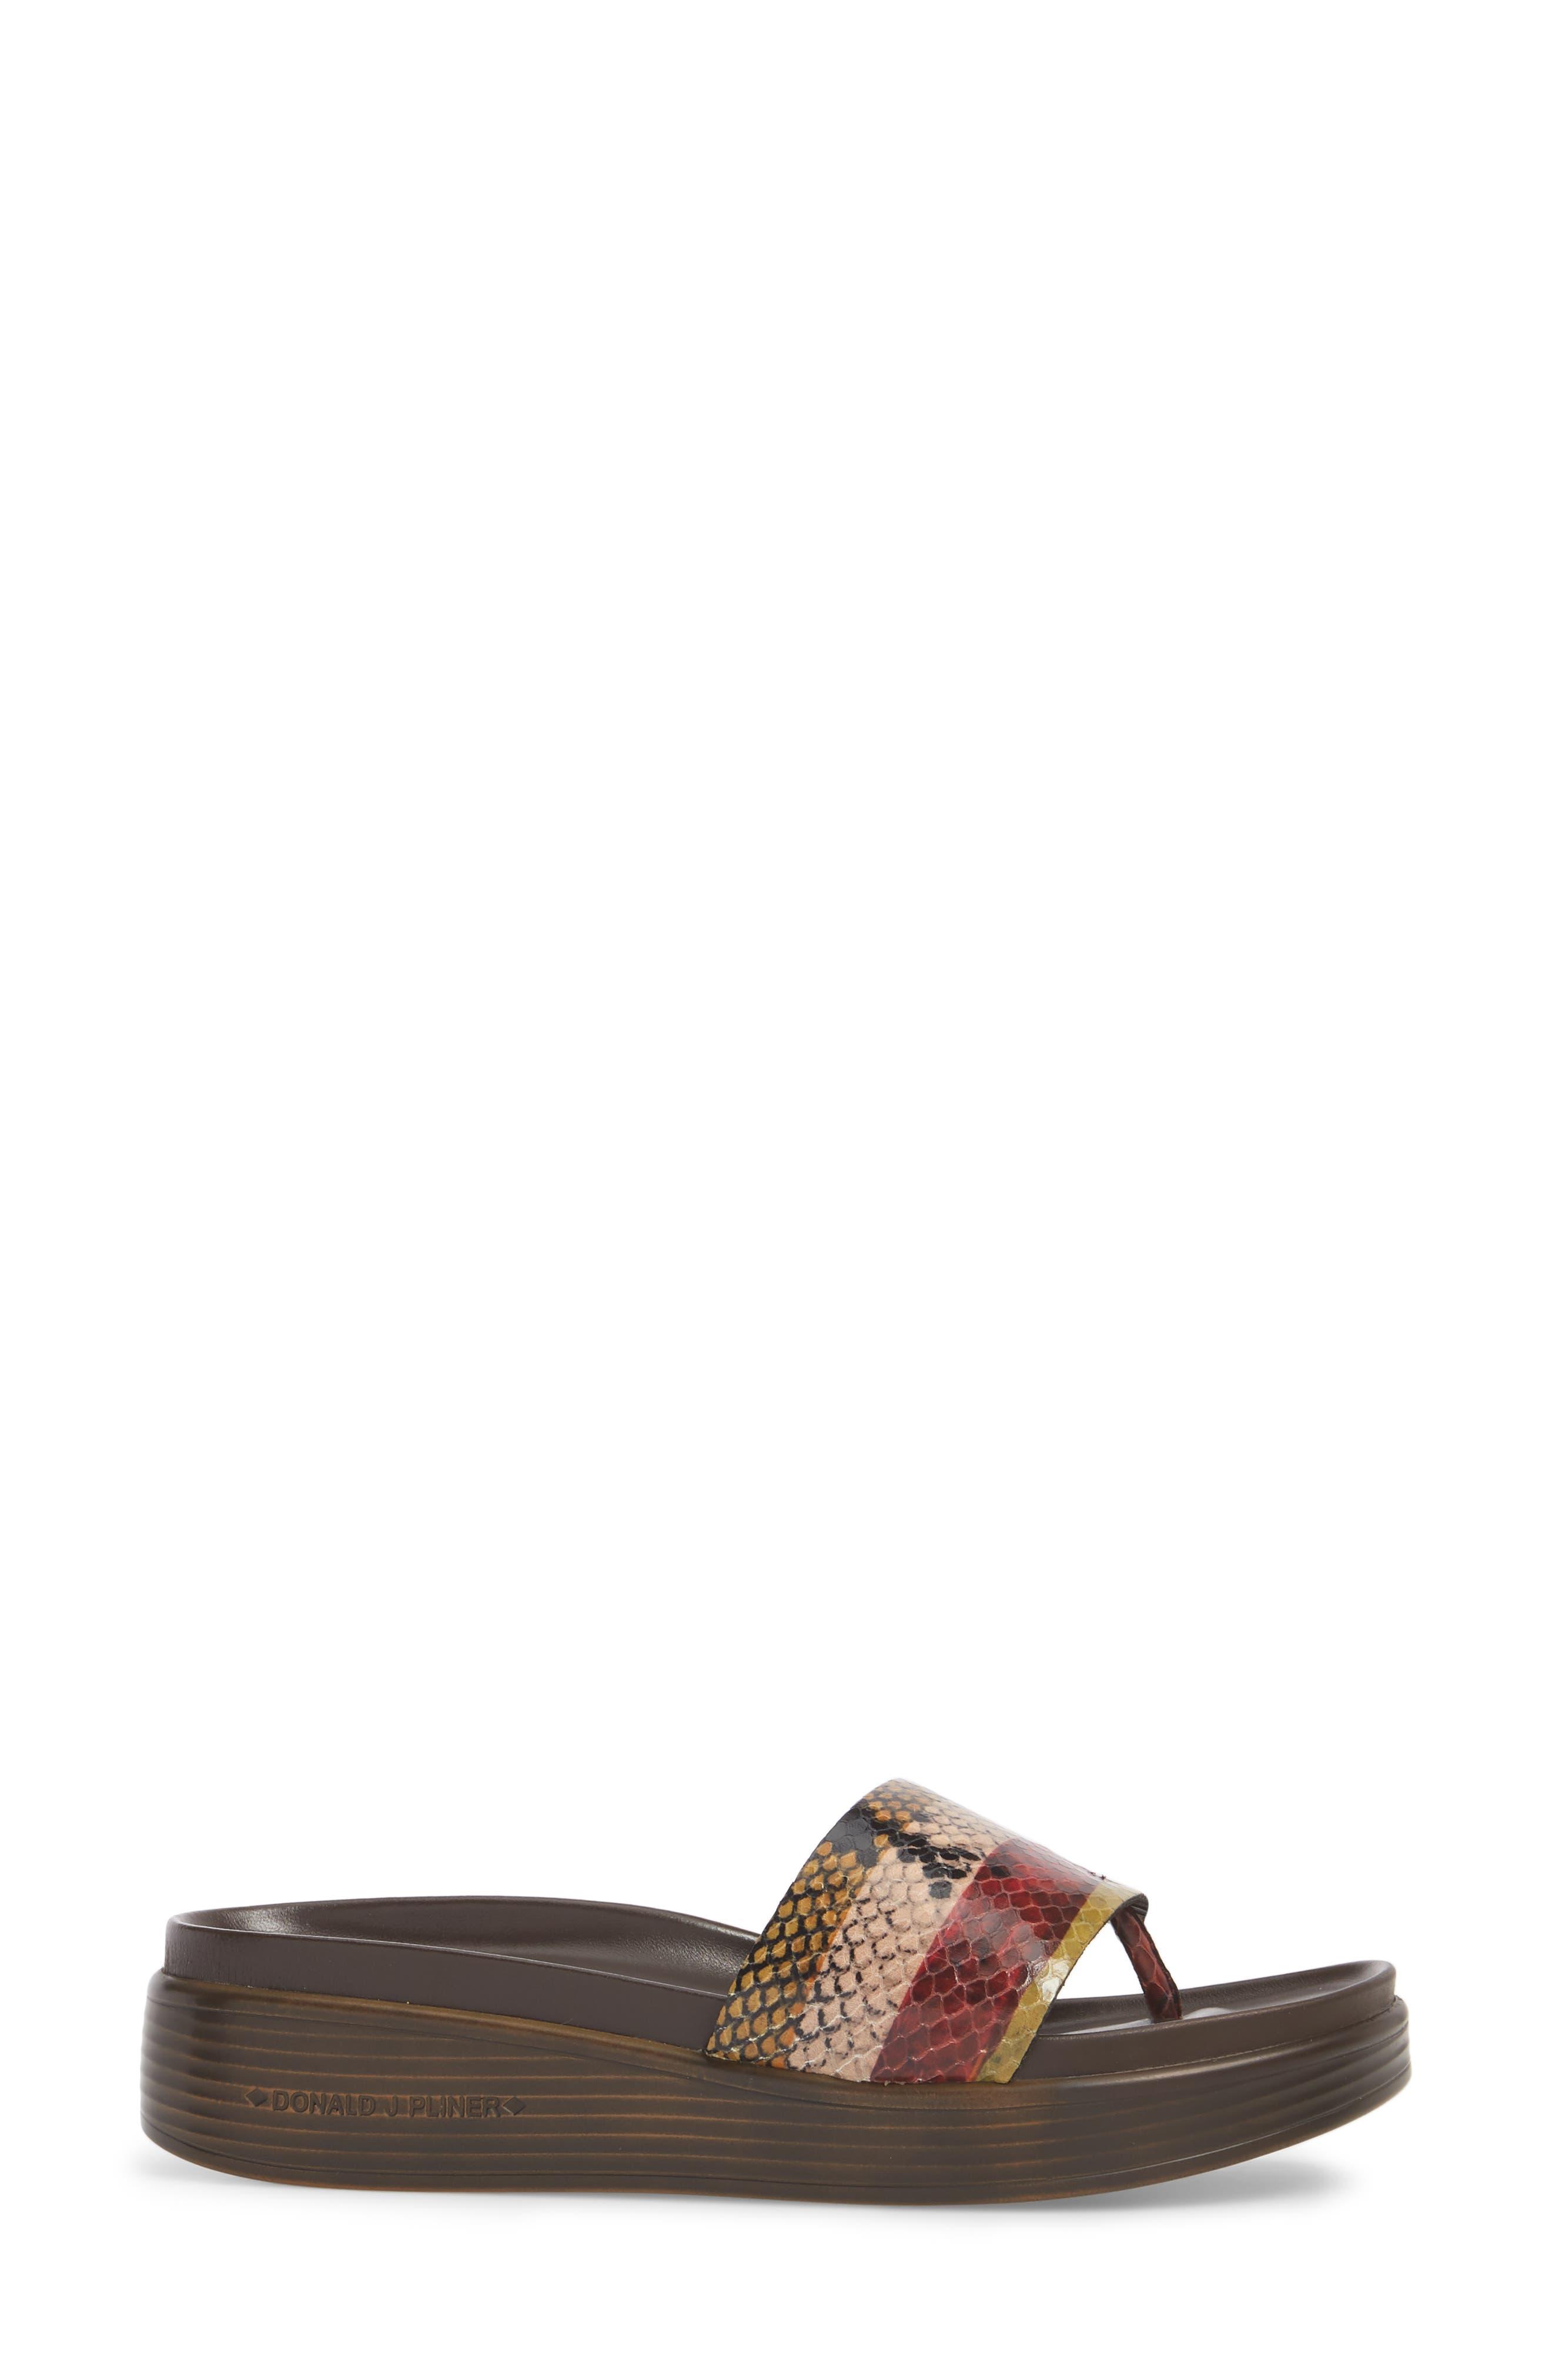 Fifi Slide Sandal,                             Alternate thumbnail 3, color,                             Fawn Leather